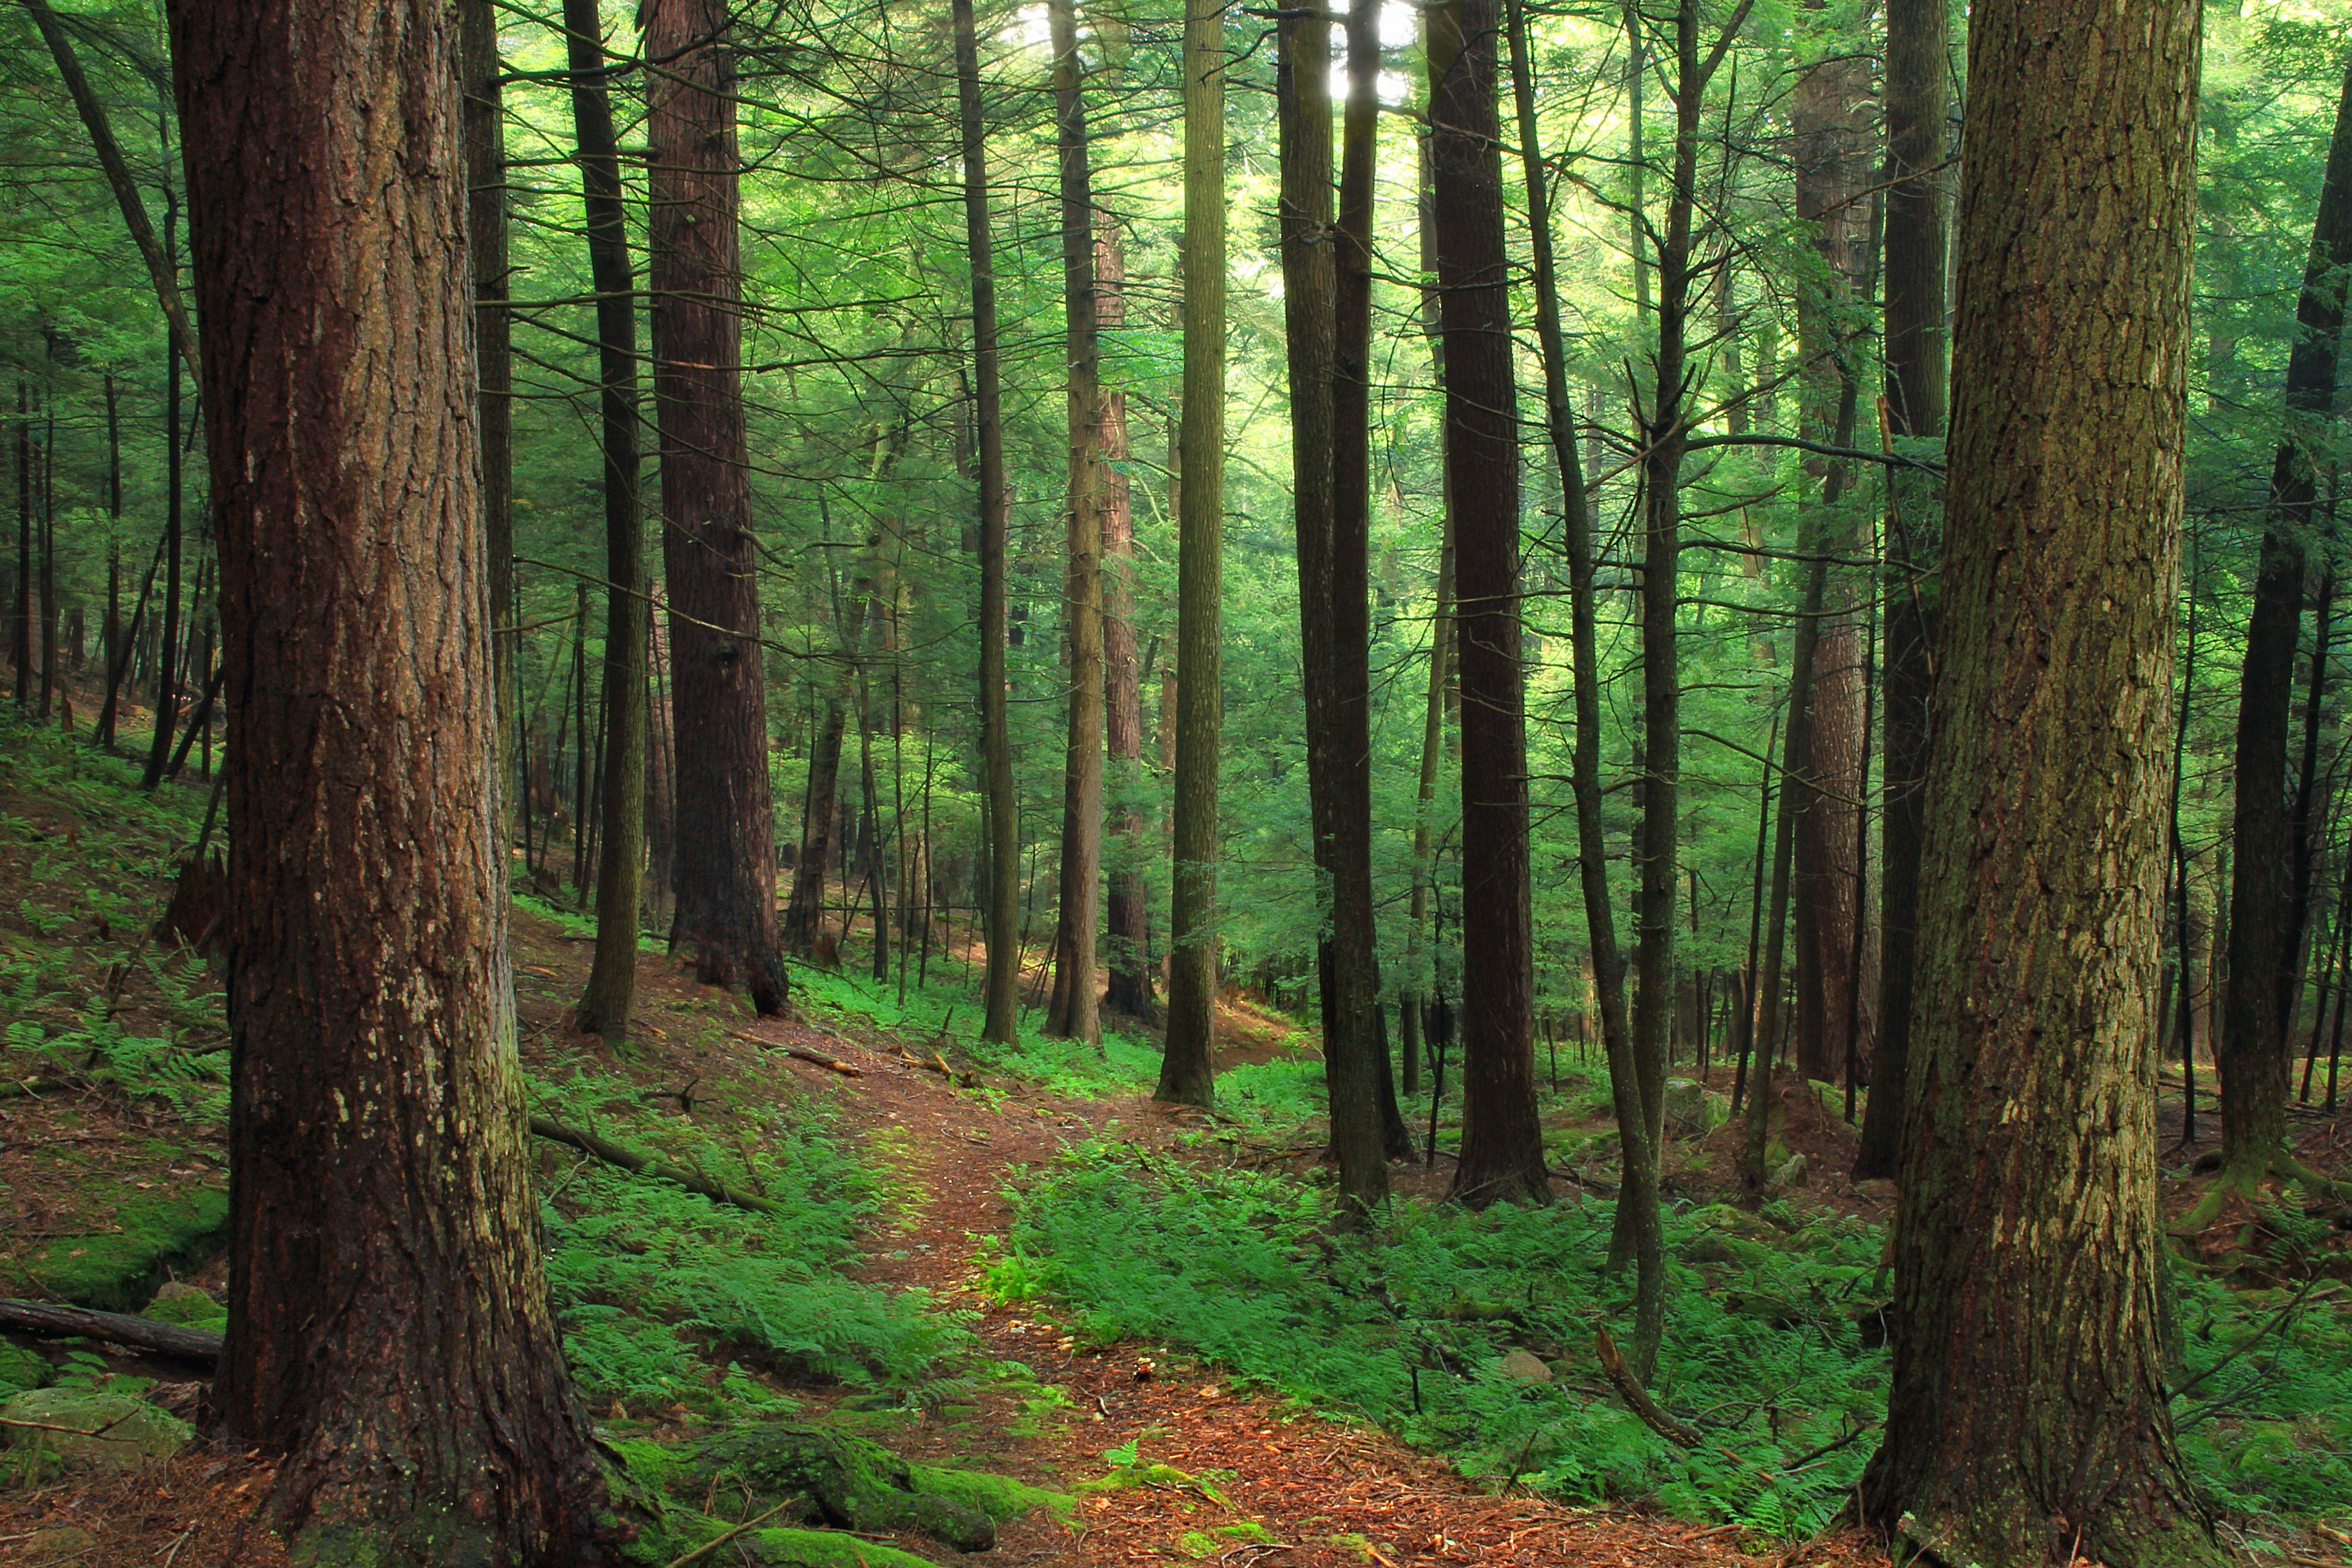 Image libre bois arbre paysage fort cologie